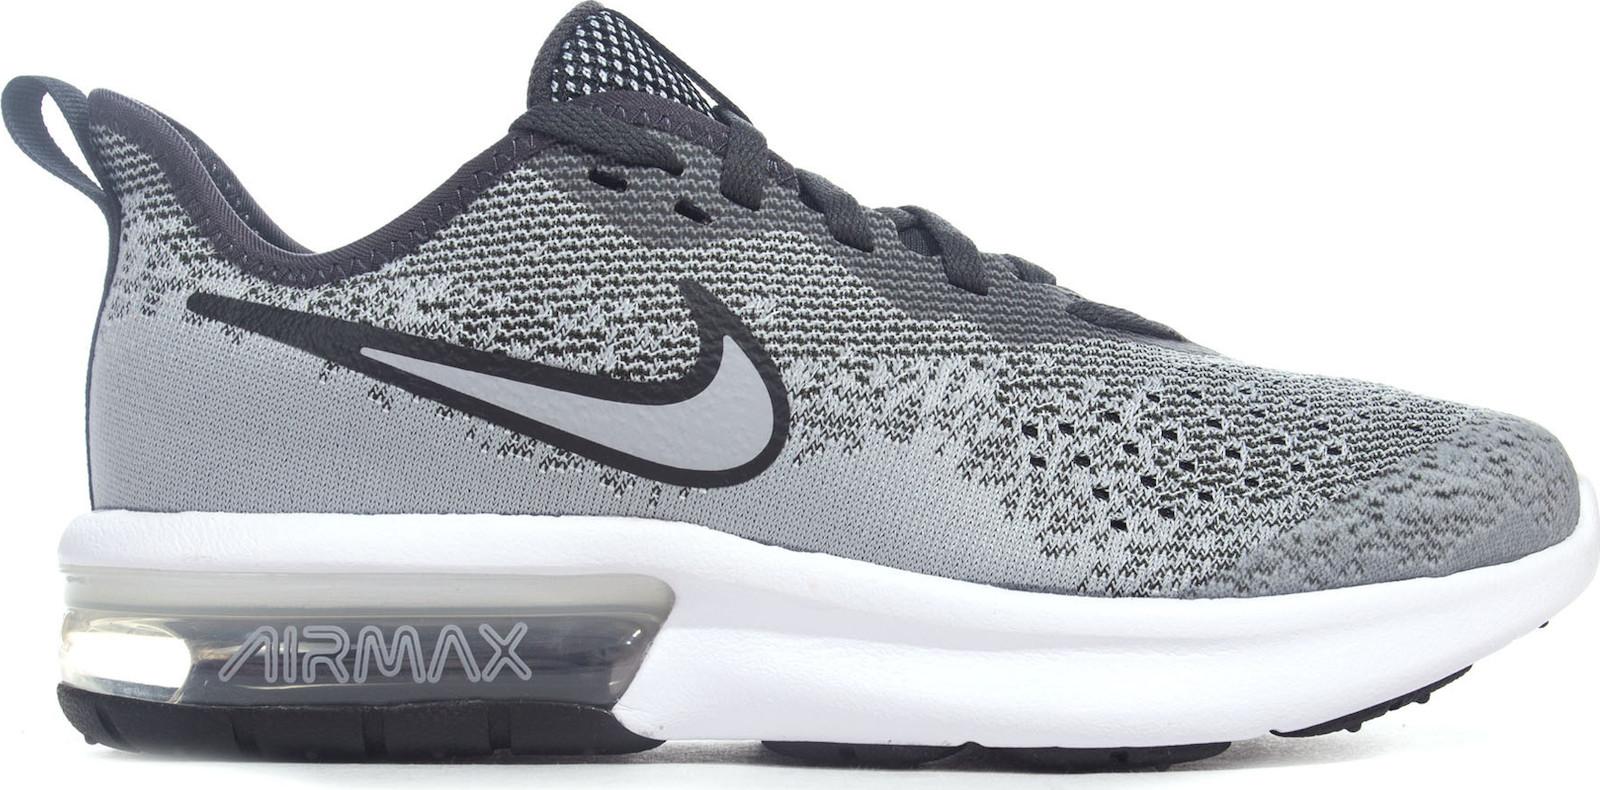 Nike Air Max Sequent 4 AQ2244-003 - Skroutz.gr d0f3b44d274